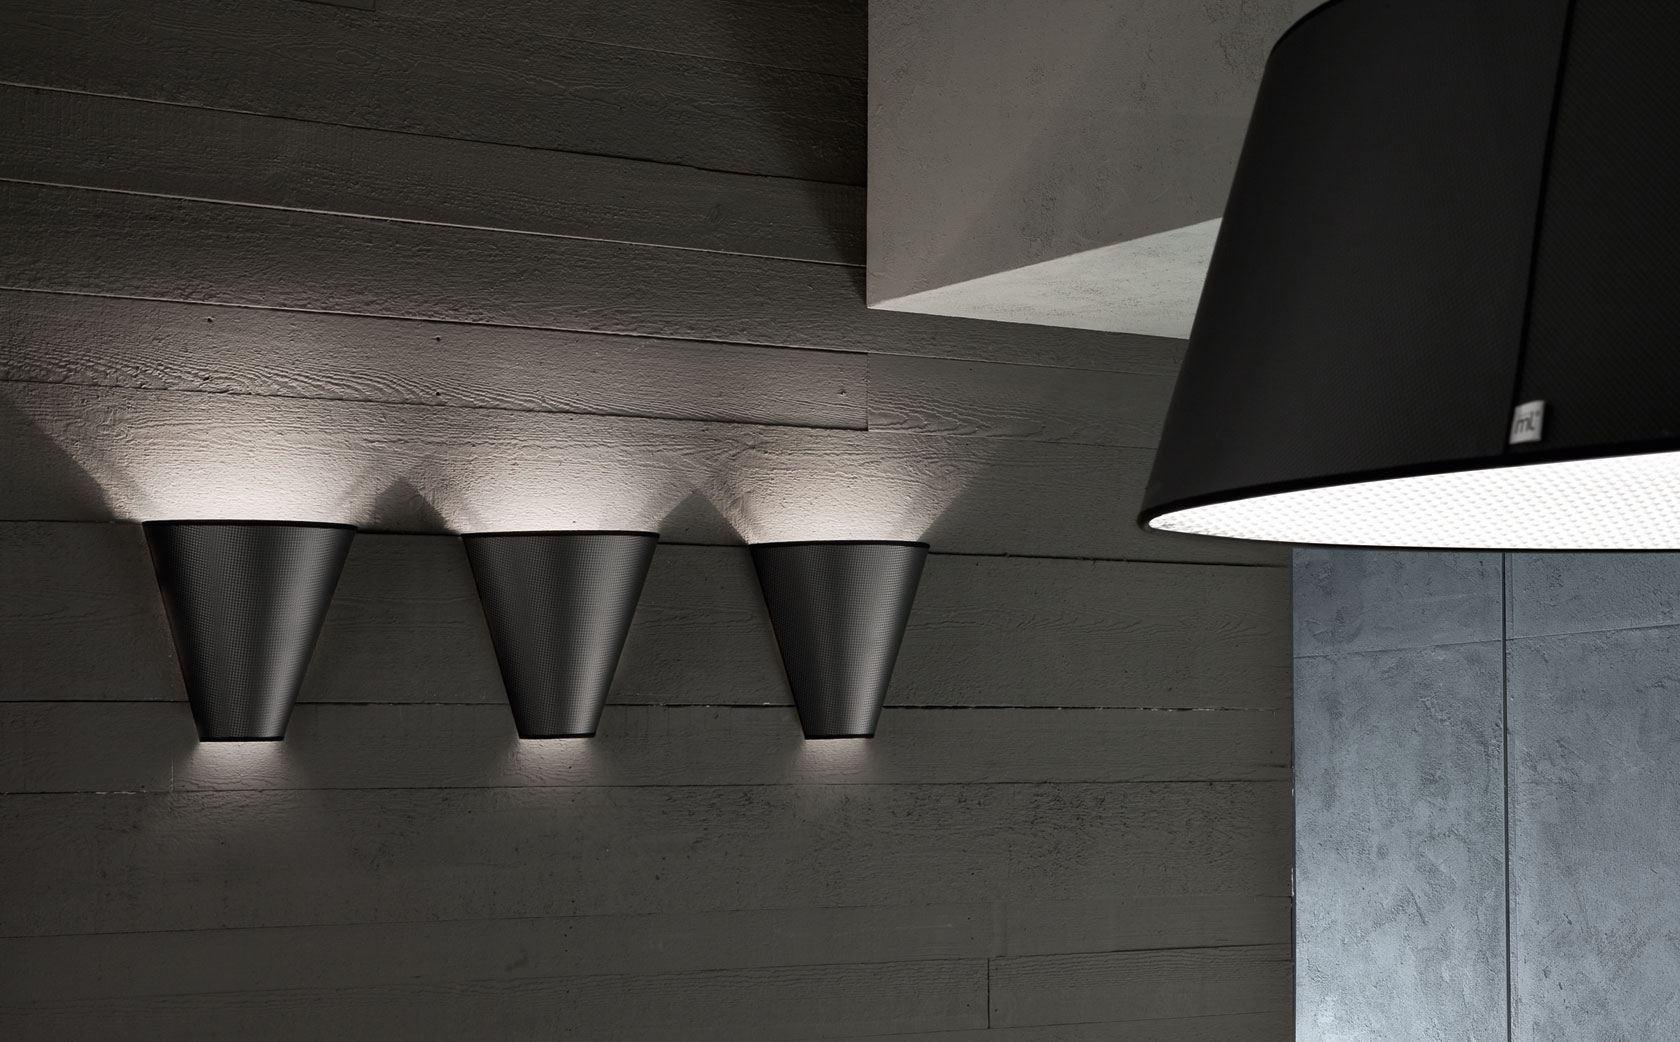 Co ap mlampshades di ml by light4 lampade a parete for Lampade a led vendita online